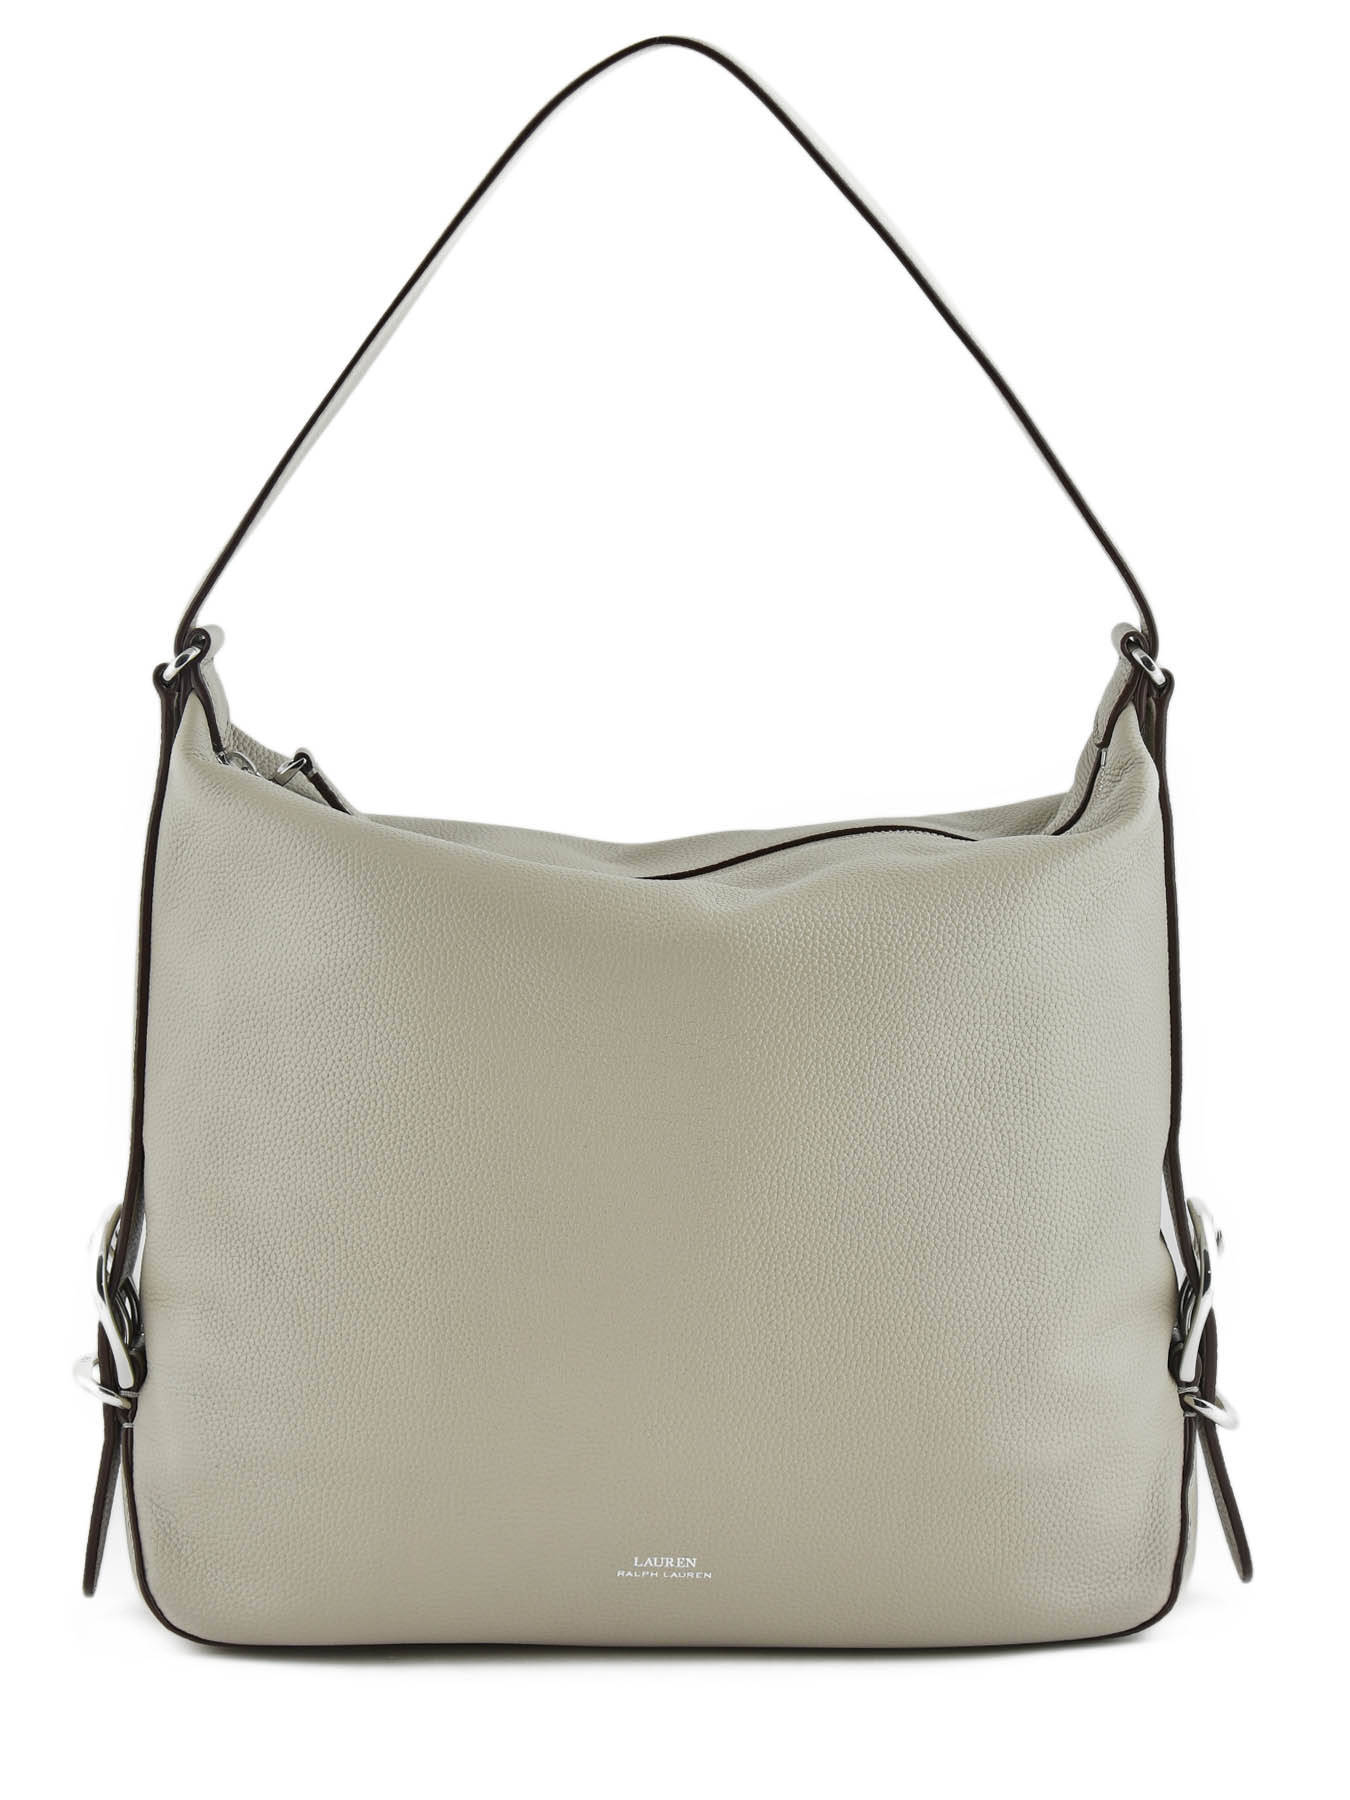 ... Crossbody Bag Cornwall Leather Lauren ralph lauren Black cornwall  31735213 ... b03037e8b2dcc